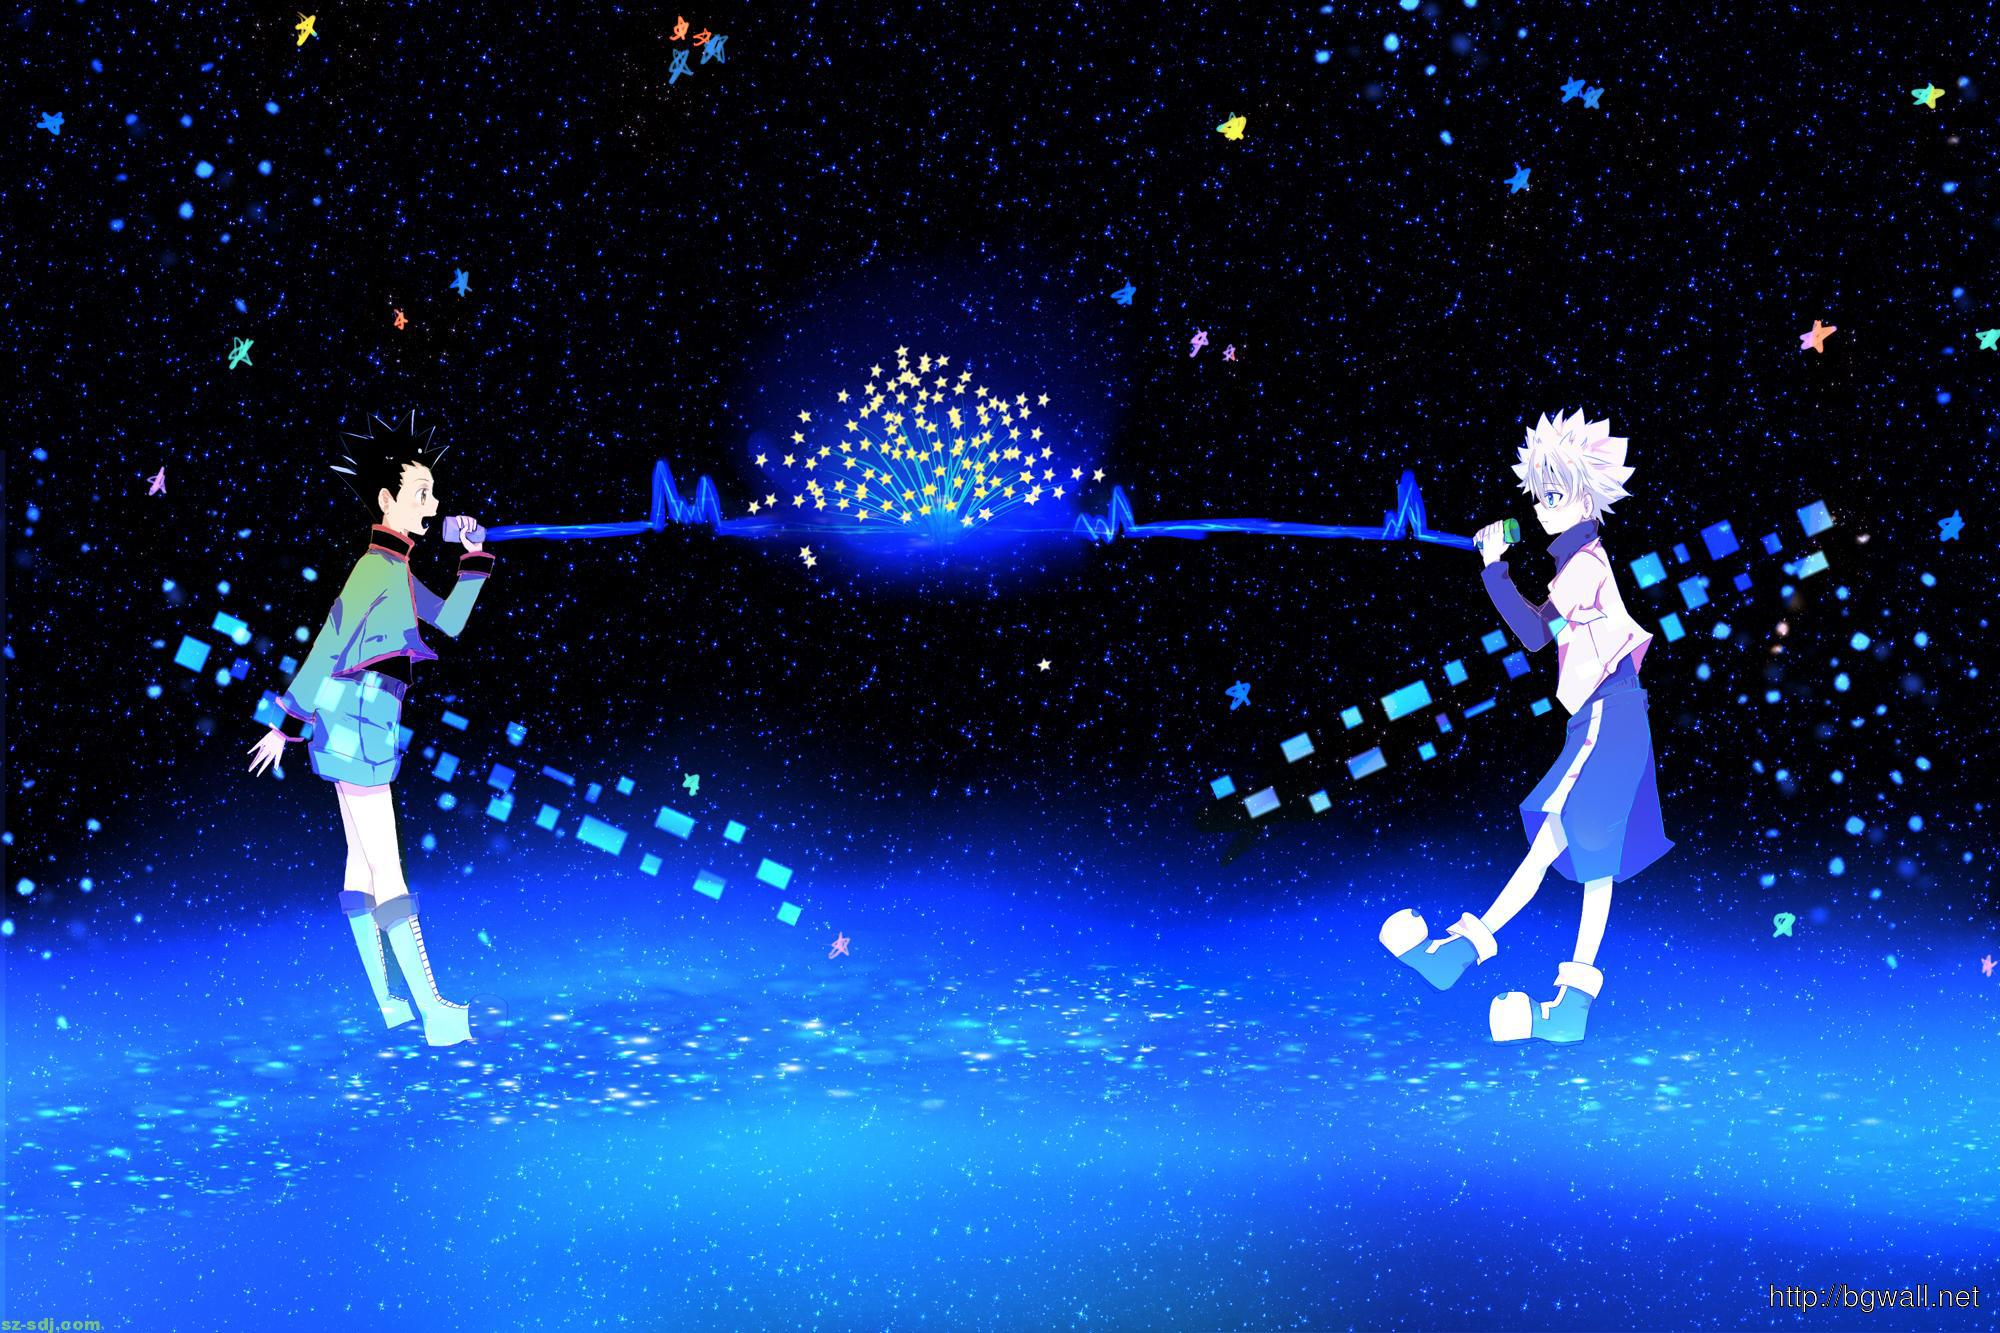 anime hunter x hunter wallpaper background wallpaper hd